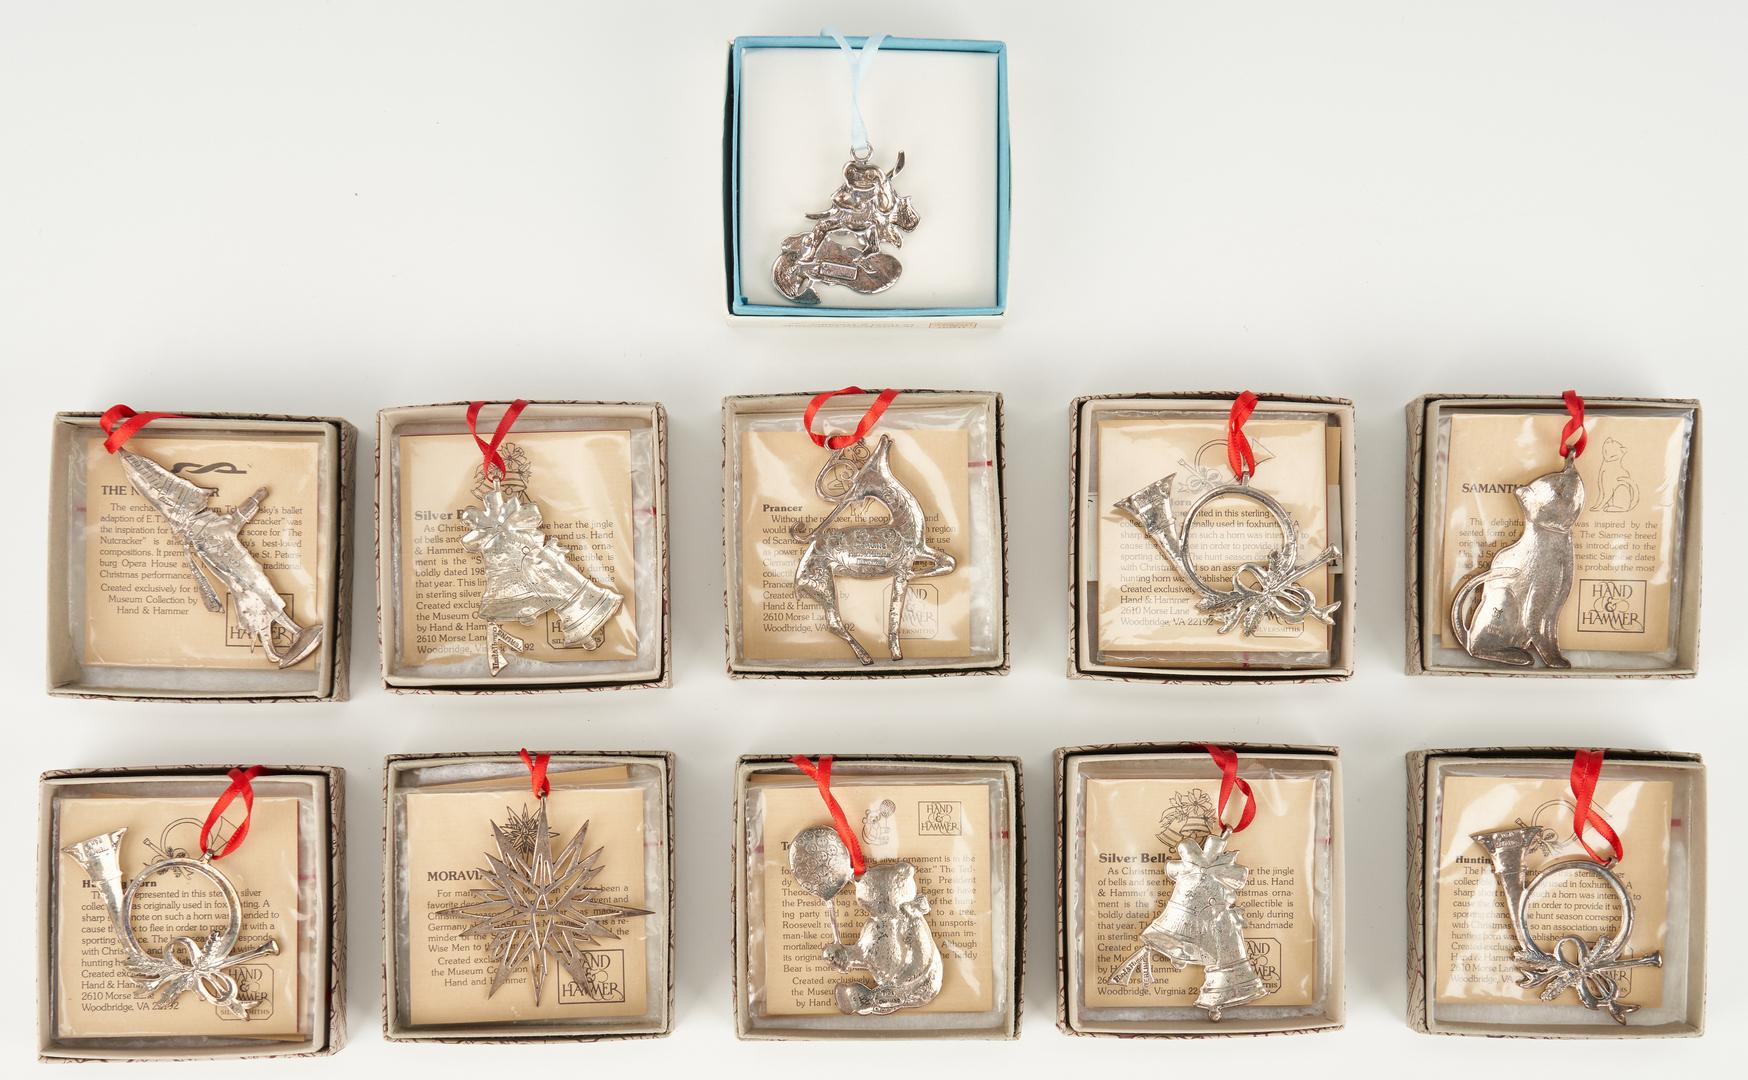 Lot 800: 20 Assorted Ornaments & Figurines, incl. Tiffany